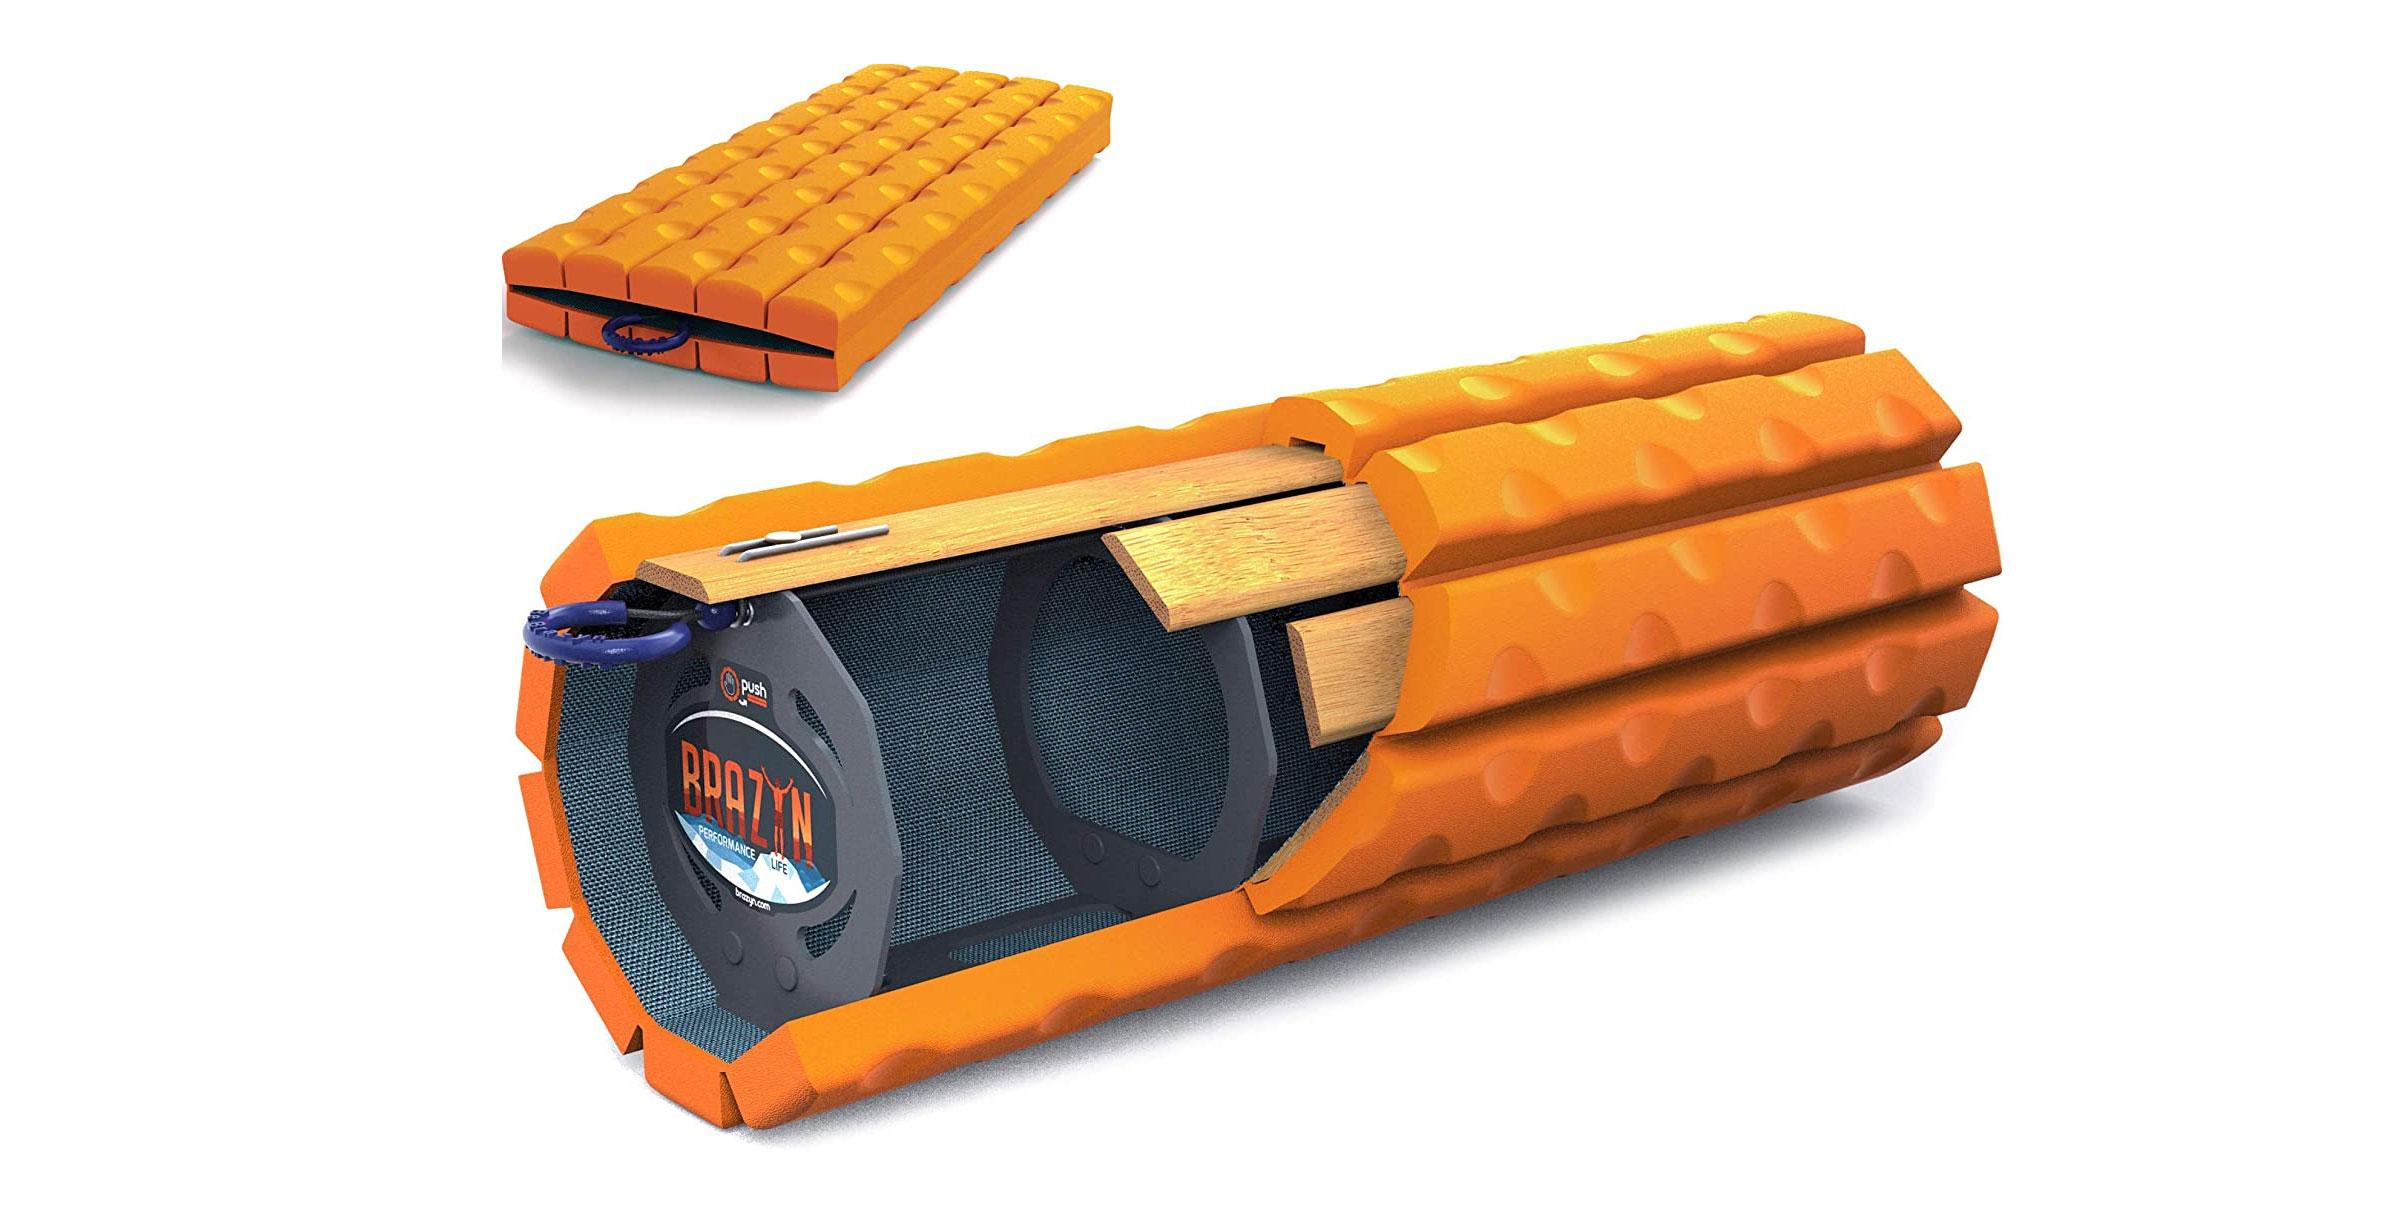 Brazyn Morph Collapsible Foam Roller